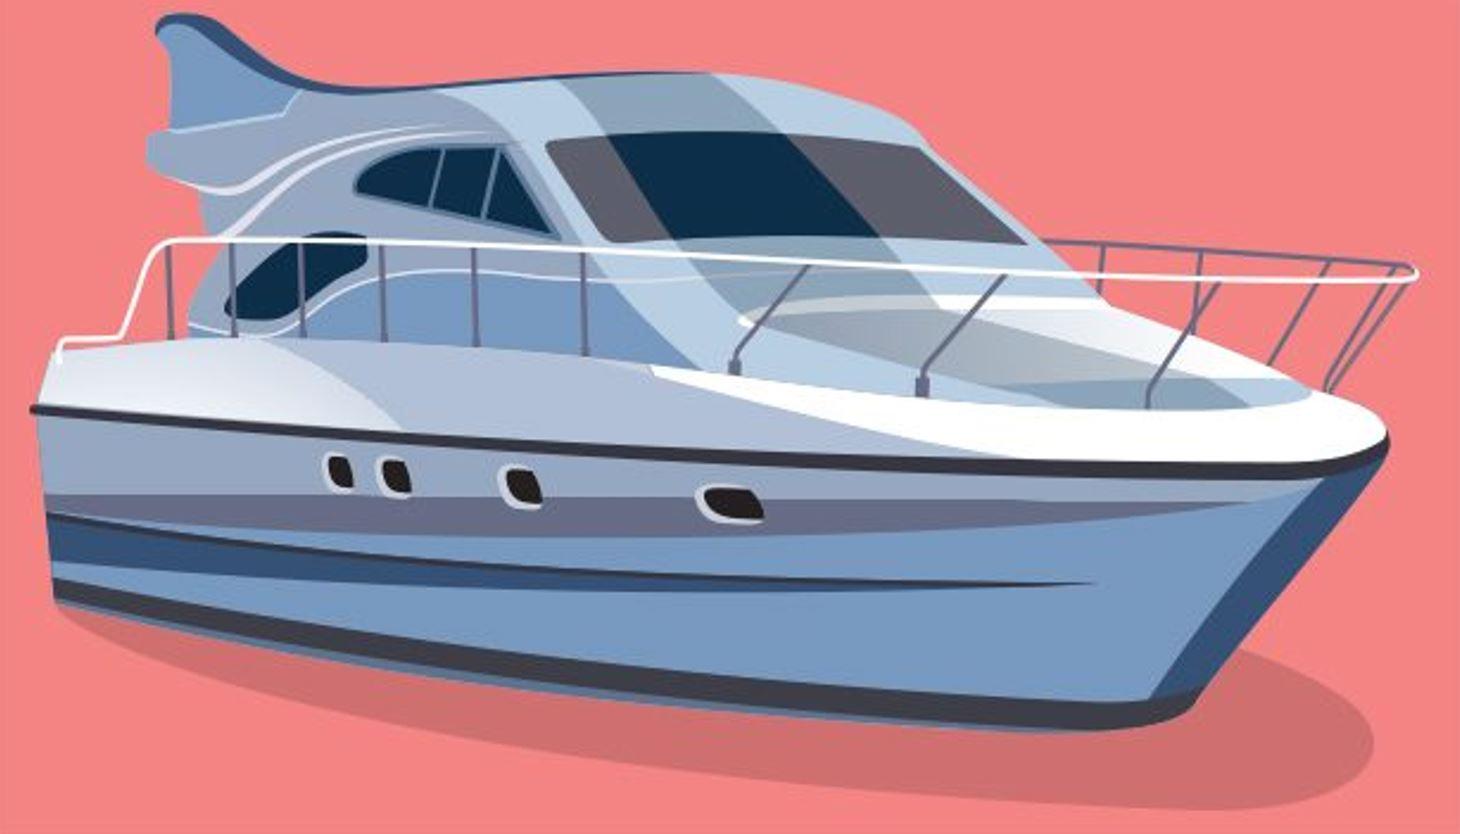 tàu thuyền composite